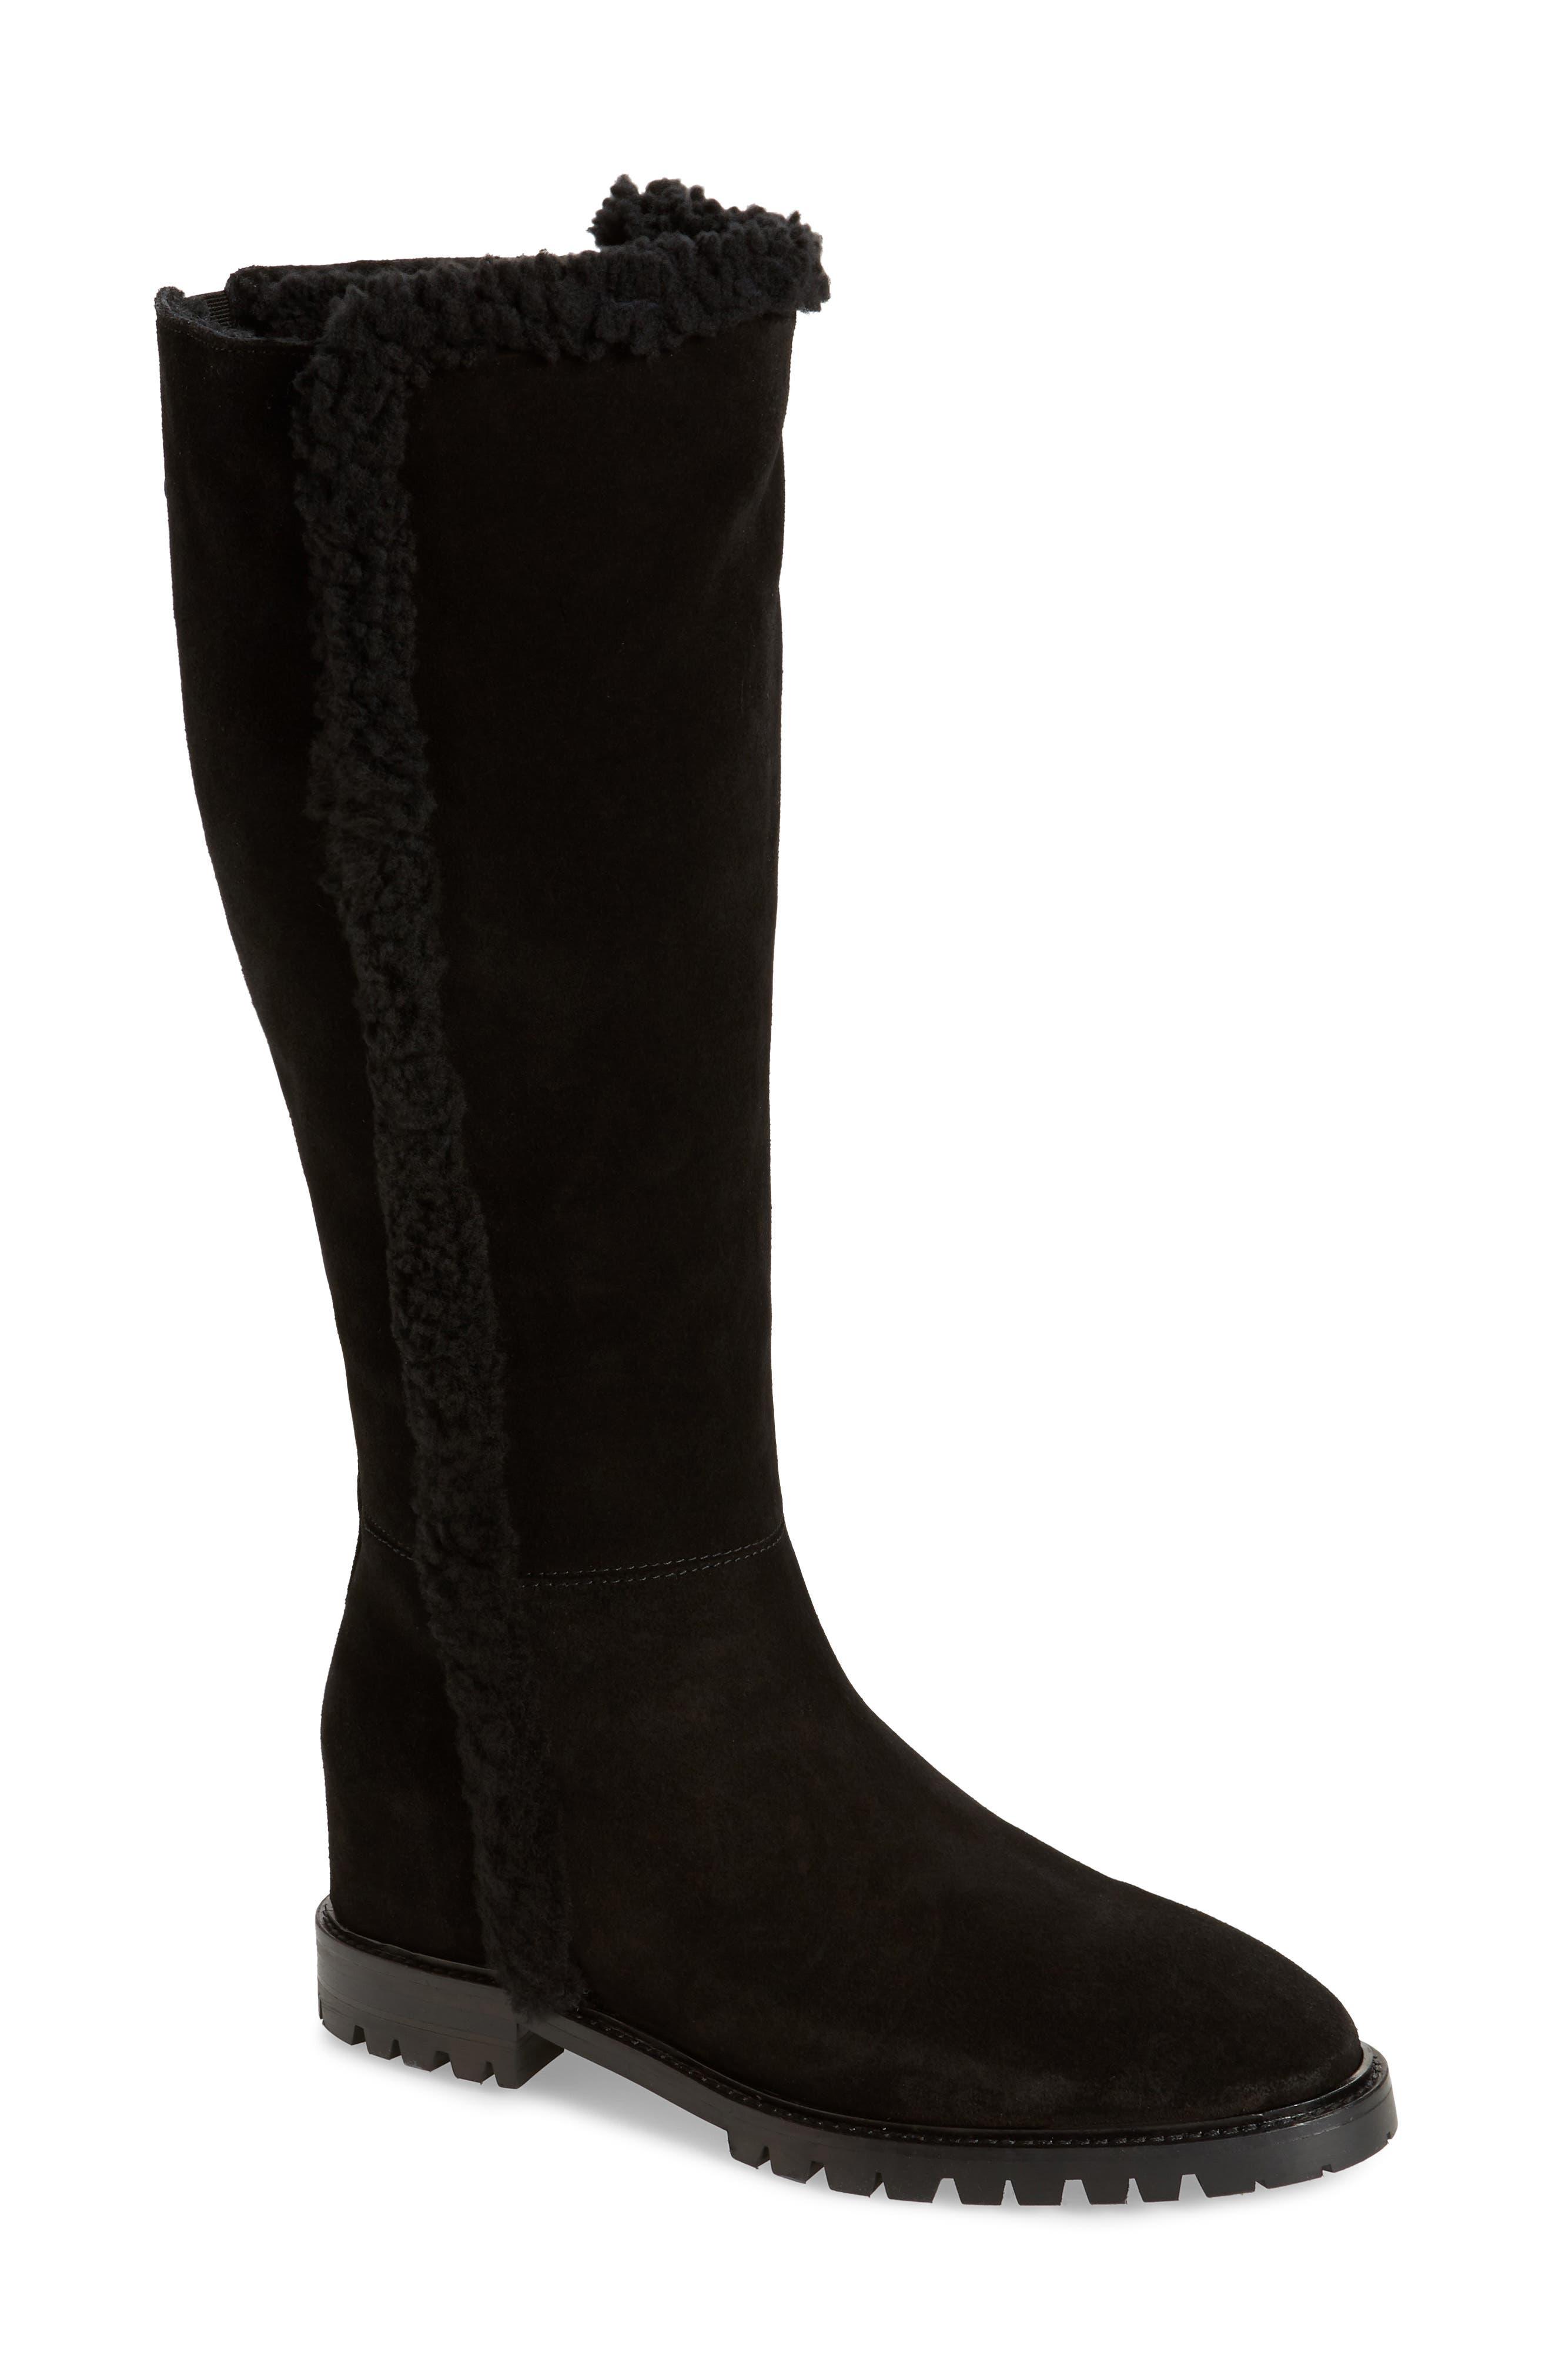 Image of Aquatalia Cheyenne Genuine Shearling Lined Weatherproof Leather Boot